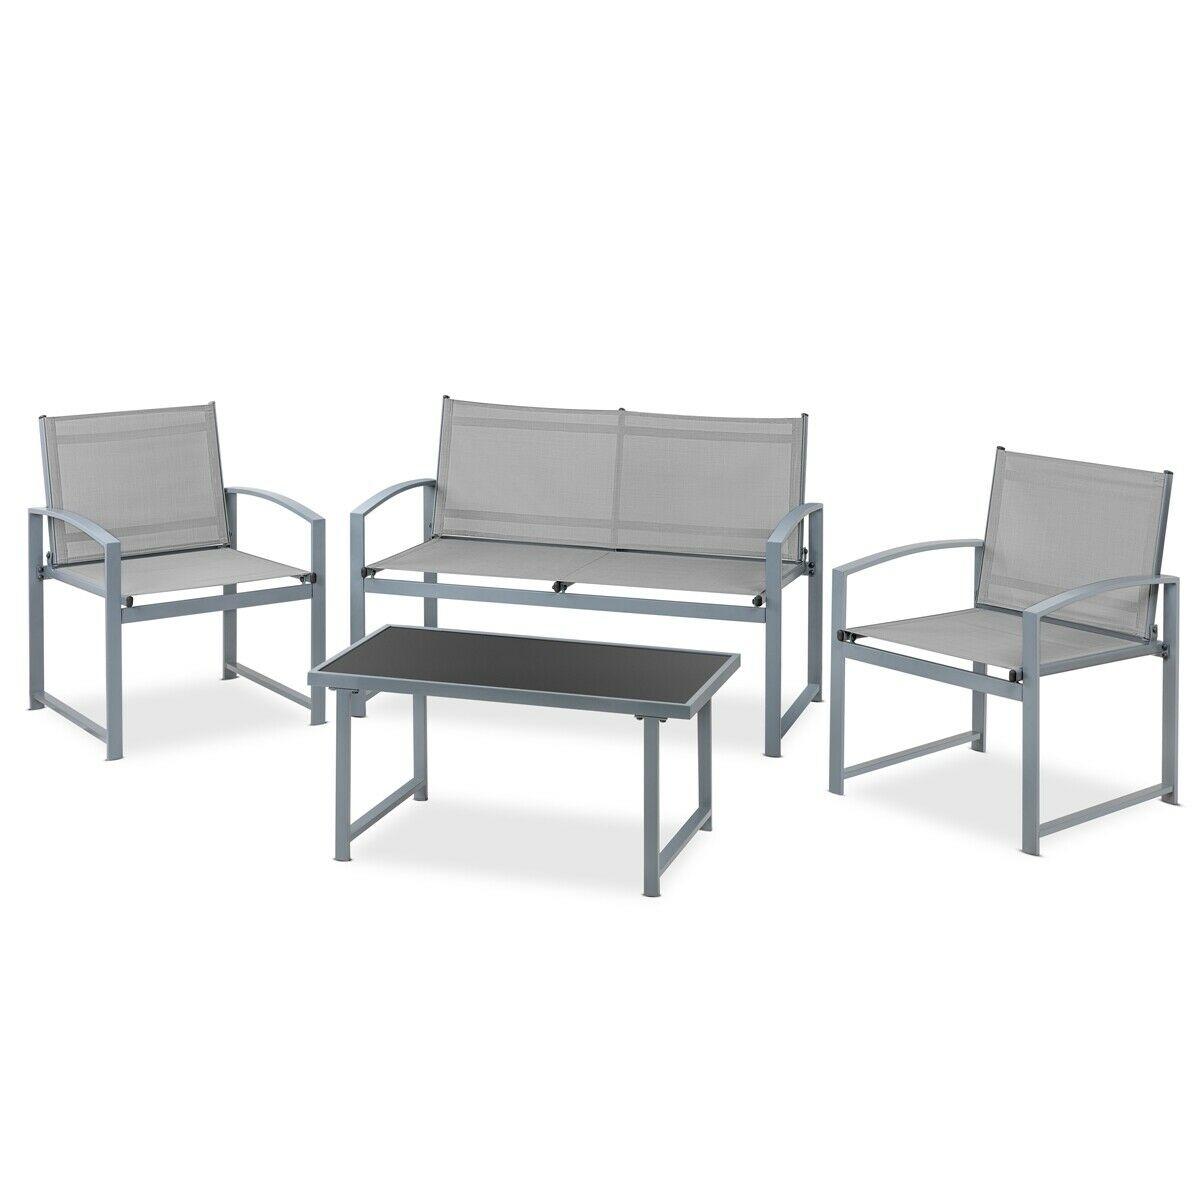 Set jardín sofá + mesa + sillas solo 59.9€